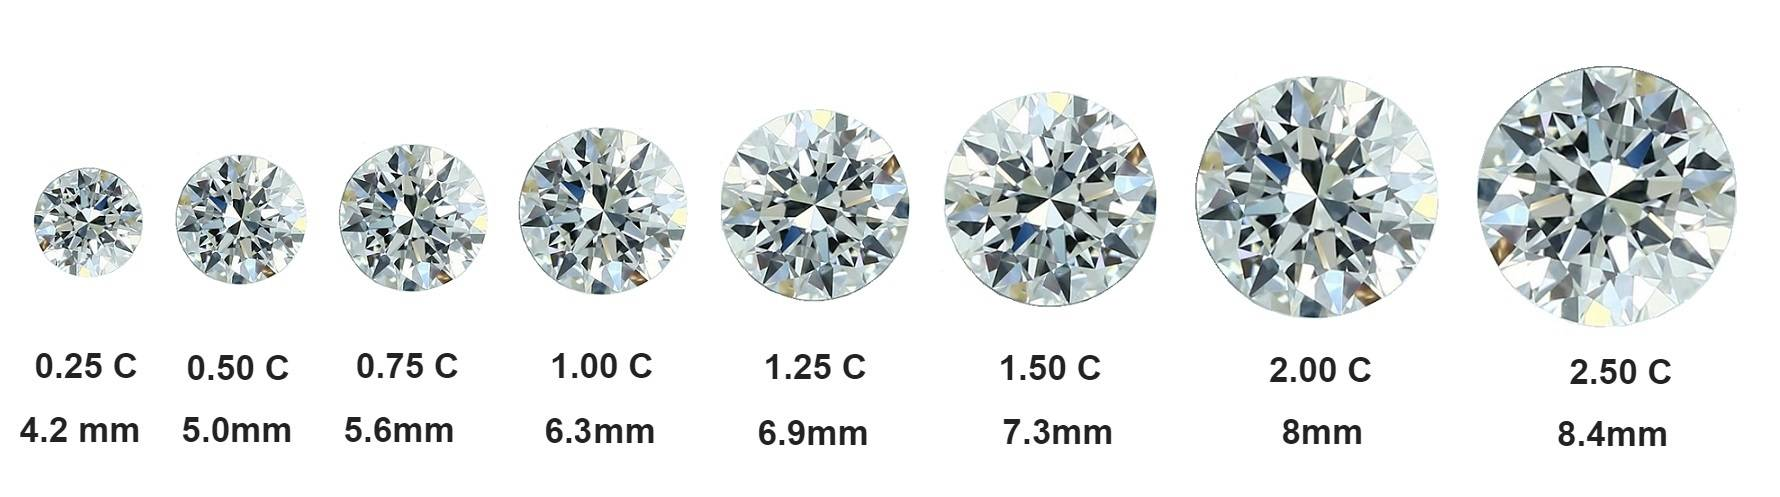 What is the size of a 1 cara diamond and a 2 carat diamond? - Pobjoy Diamonds